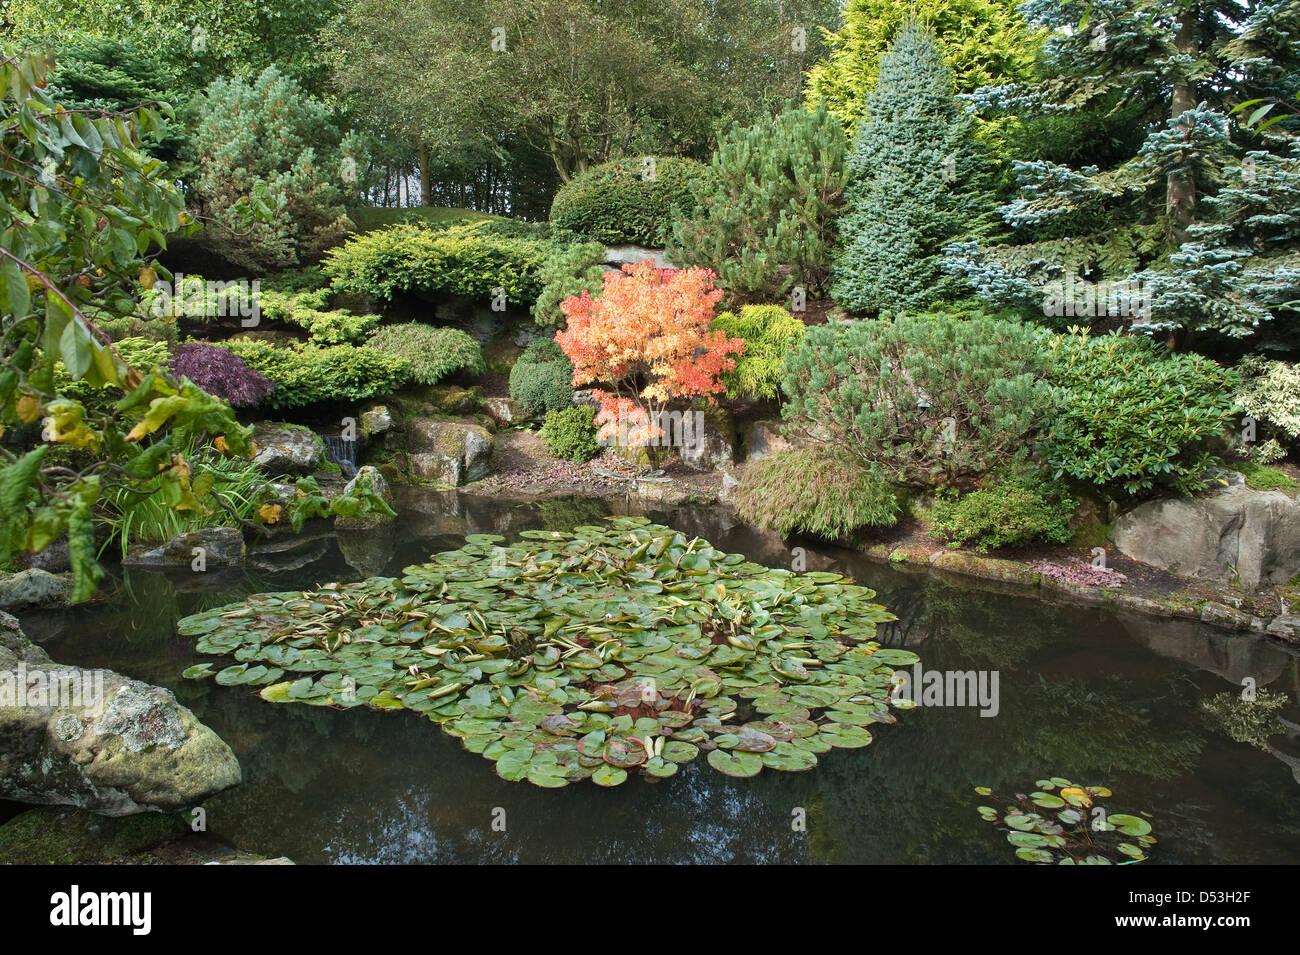 Pond in a rock garden design by bahaa seedhom north for Free rock garden designs